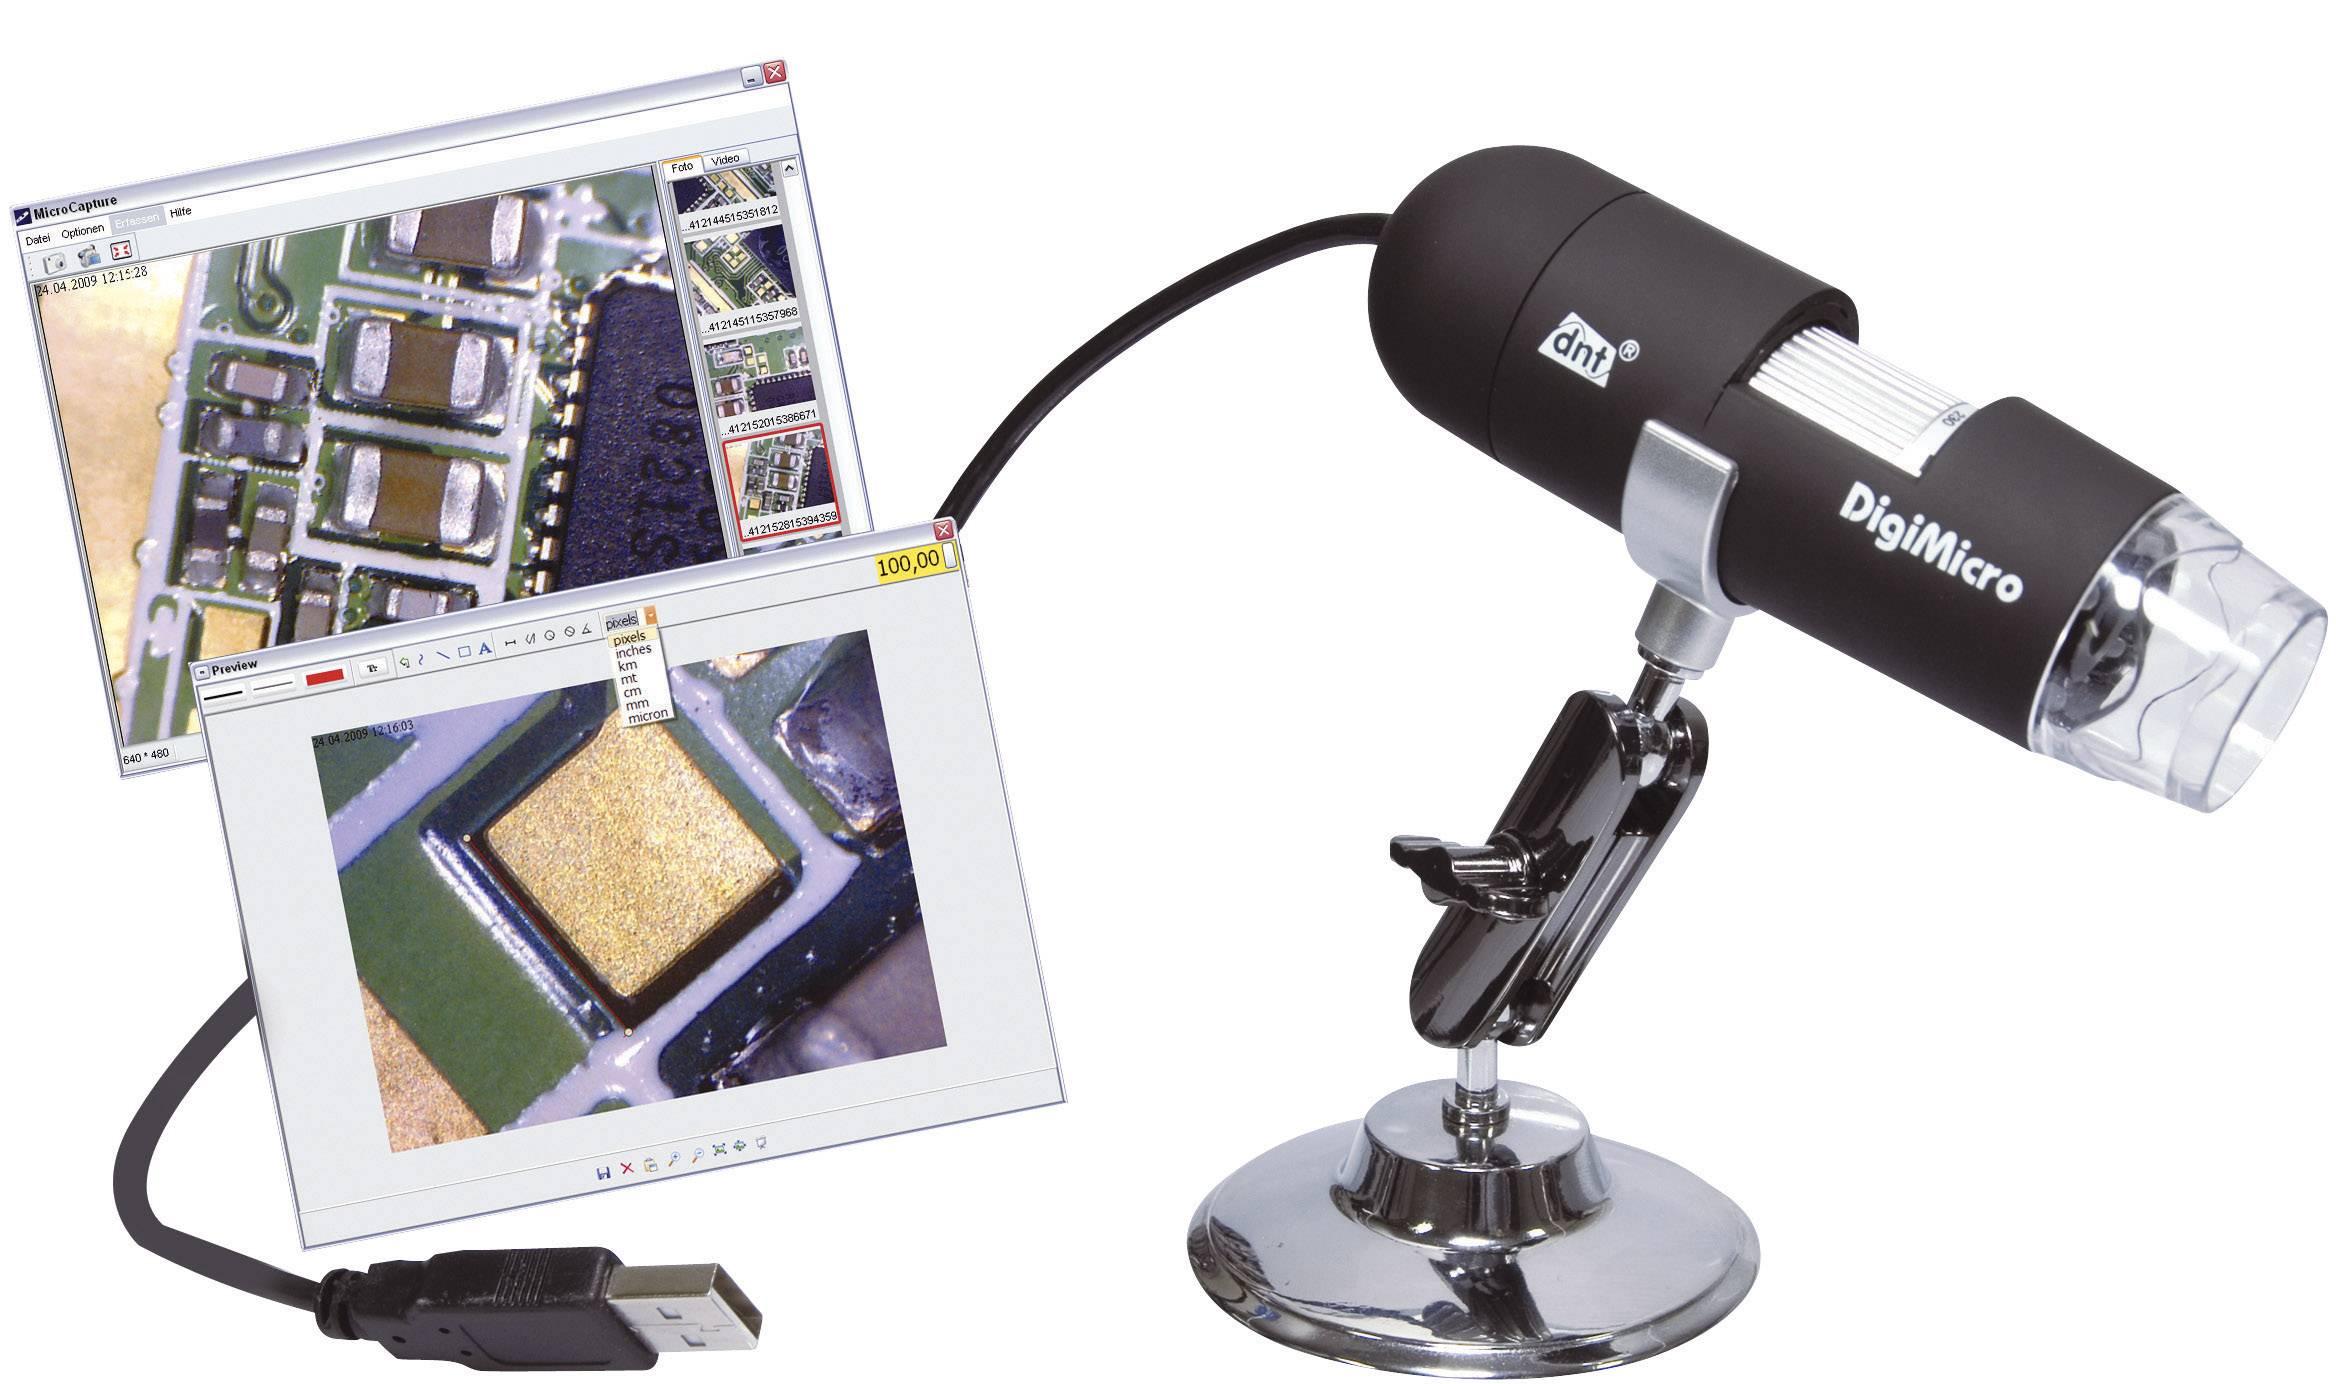 Usb mikroskop dnt mio pixel digitale vergrößerung max x